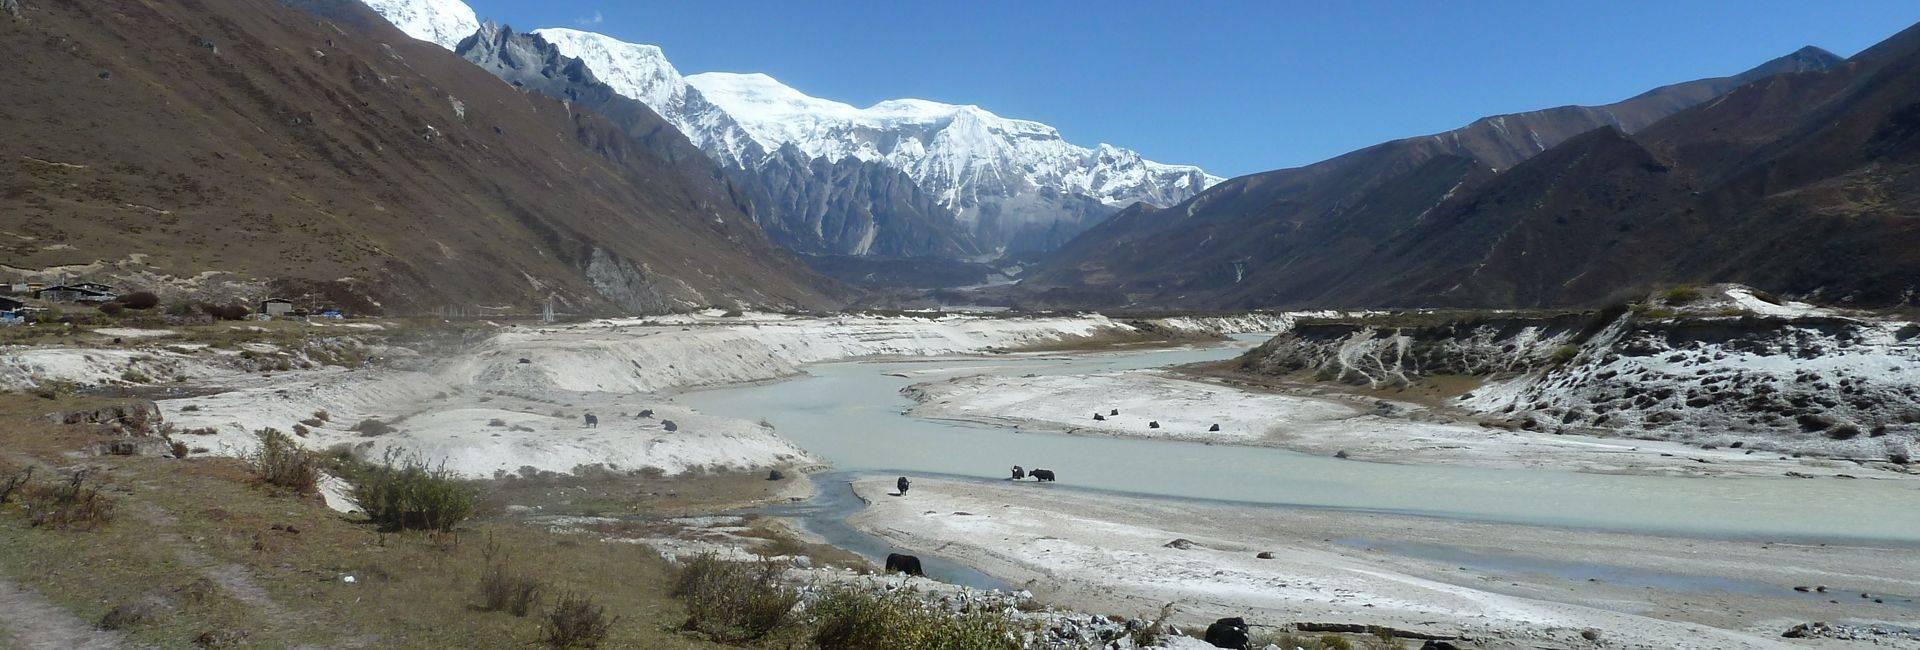 Lunana valley